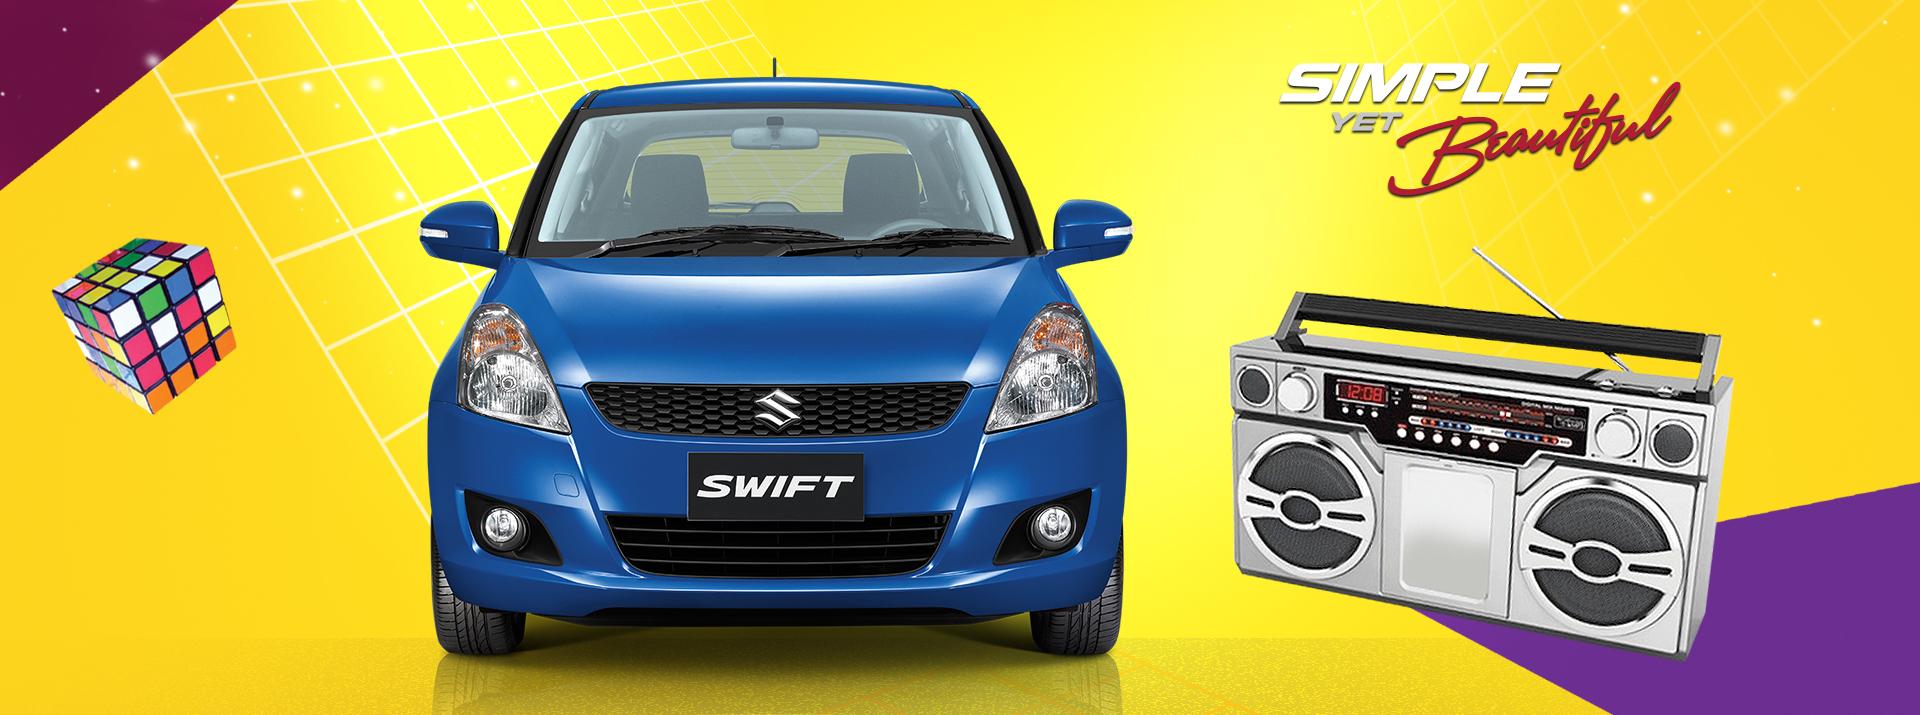 Swift-banner5